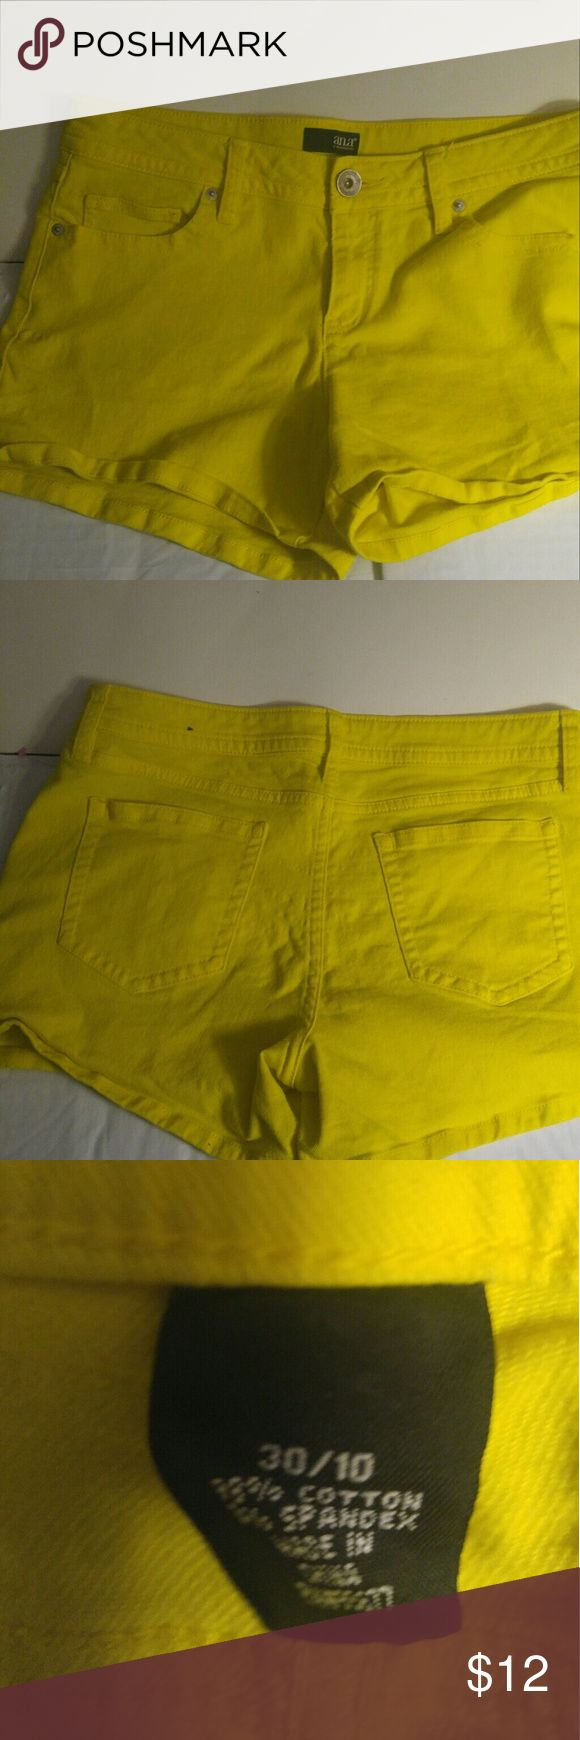 "Ana women's yellow shorts size 30/10 NWOT cute Yellow shorts zip and button 34"" waist, 12"" long, 4"" inseam, 9"" rise Ana Shorts Jean Shorts"